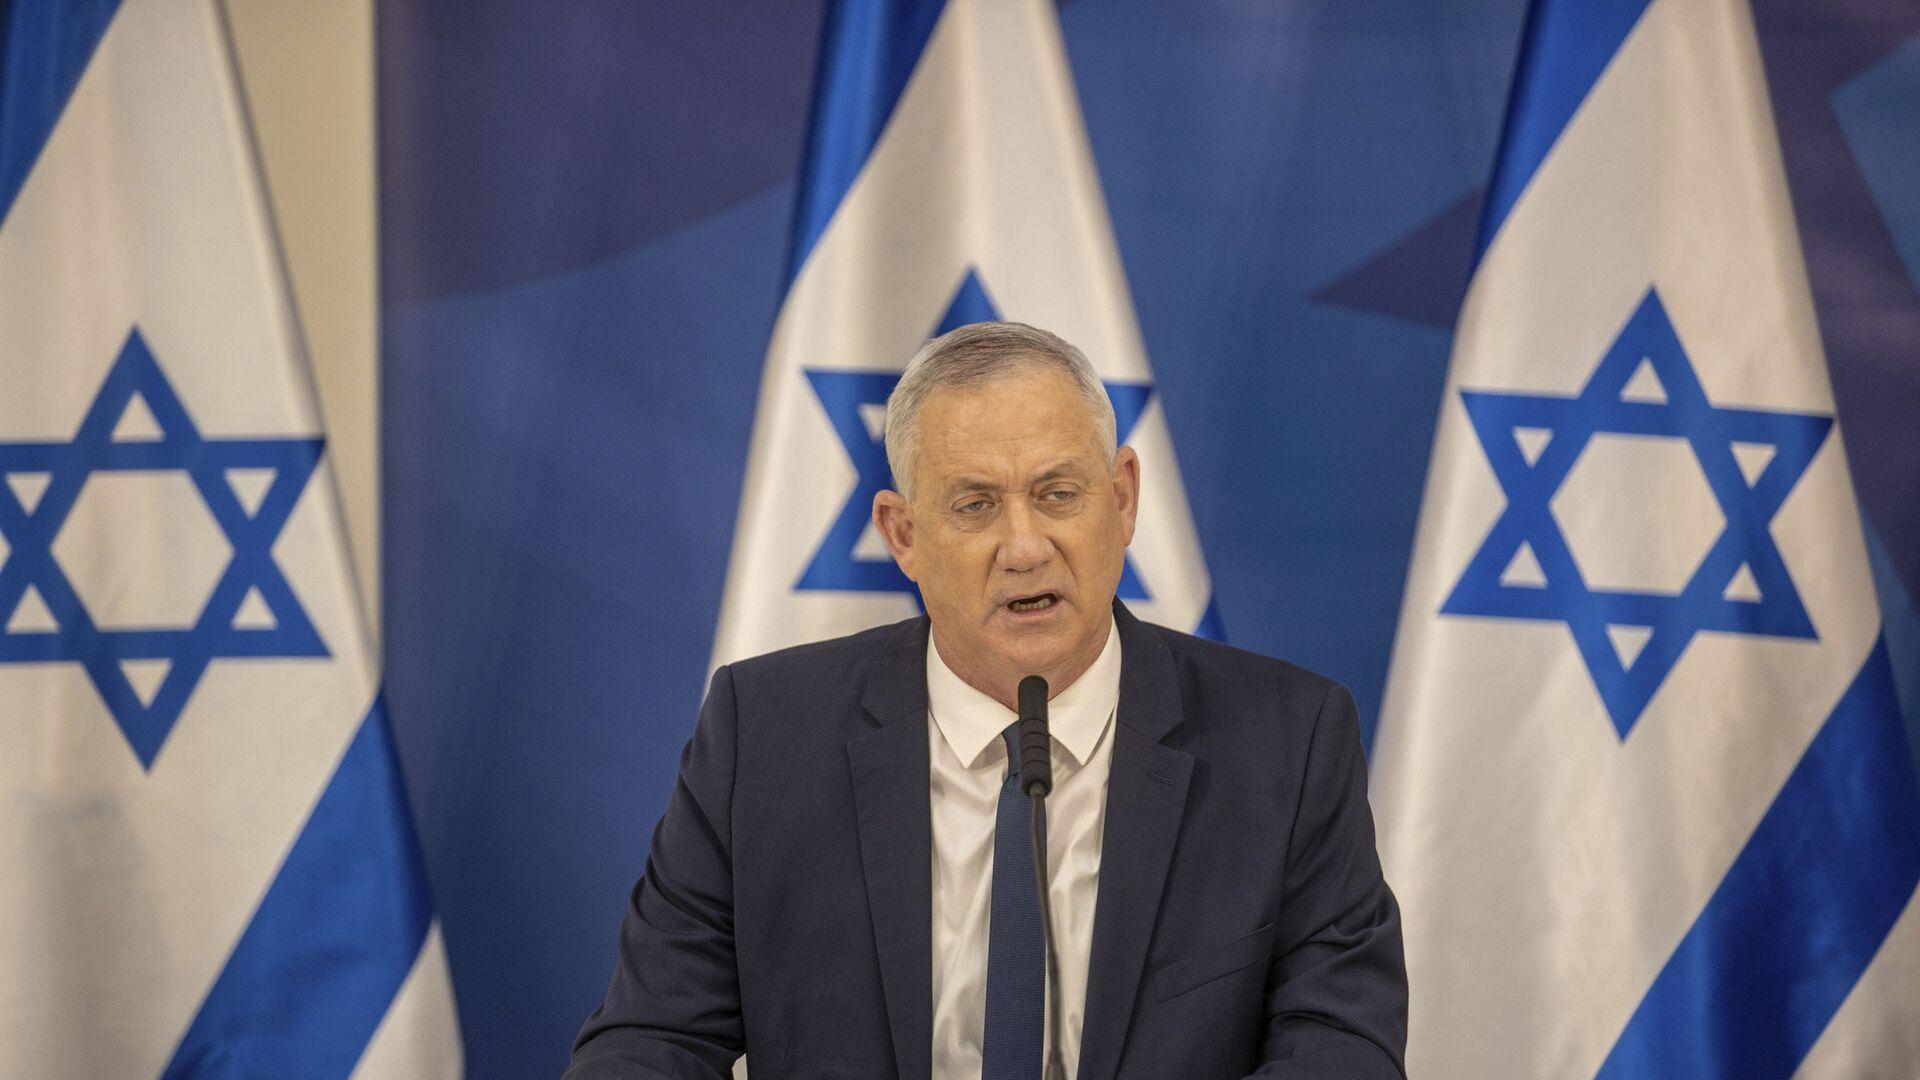 Israeli Defense Minister Benny Gantz issues a statement at the Israeli Defense Ministry in Tel Aviv, Israel, Monday, July 27, 2020. - Sputnik International, 1920, 17.09.2021